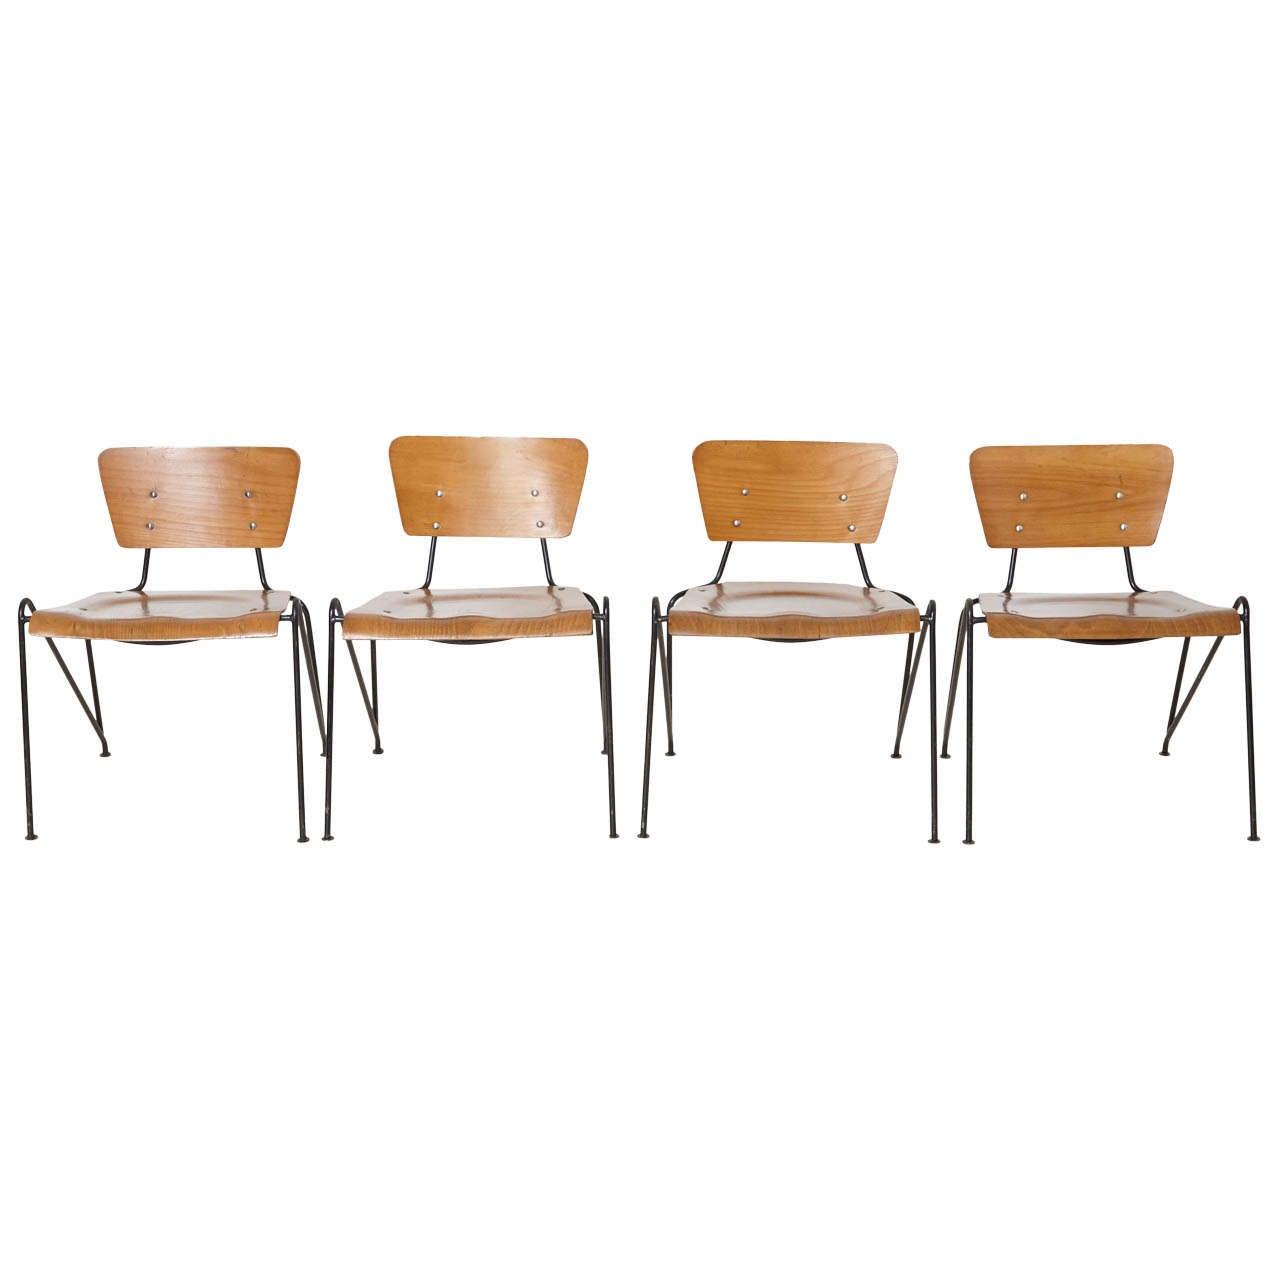 Gastone Rinaldi Chairs